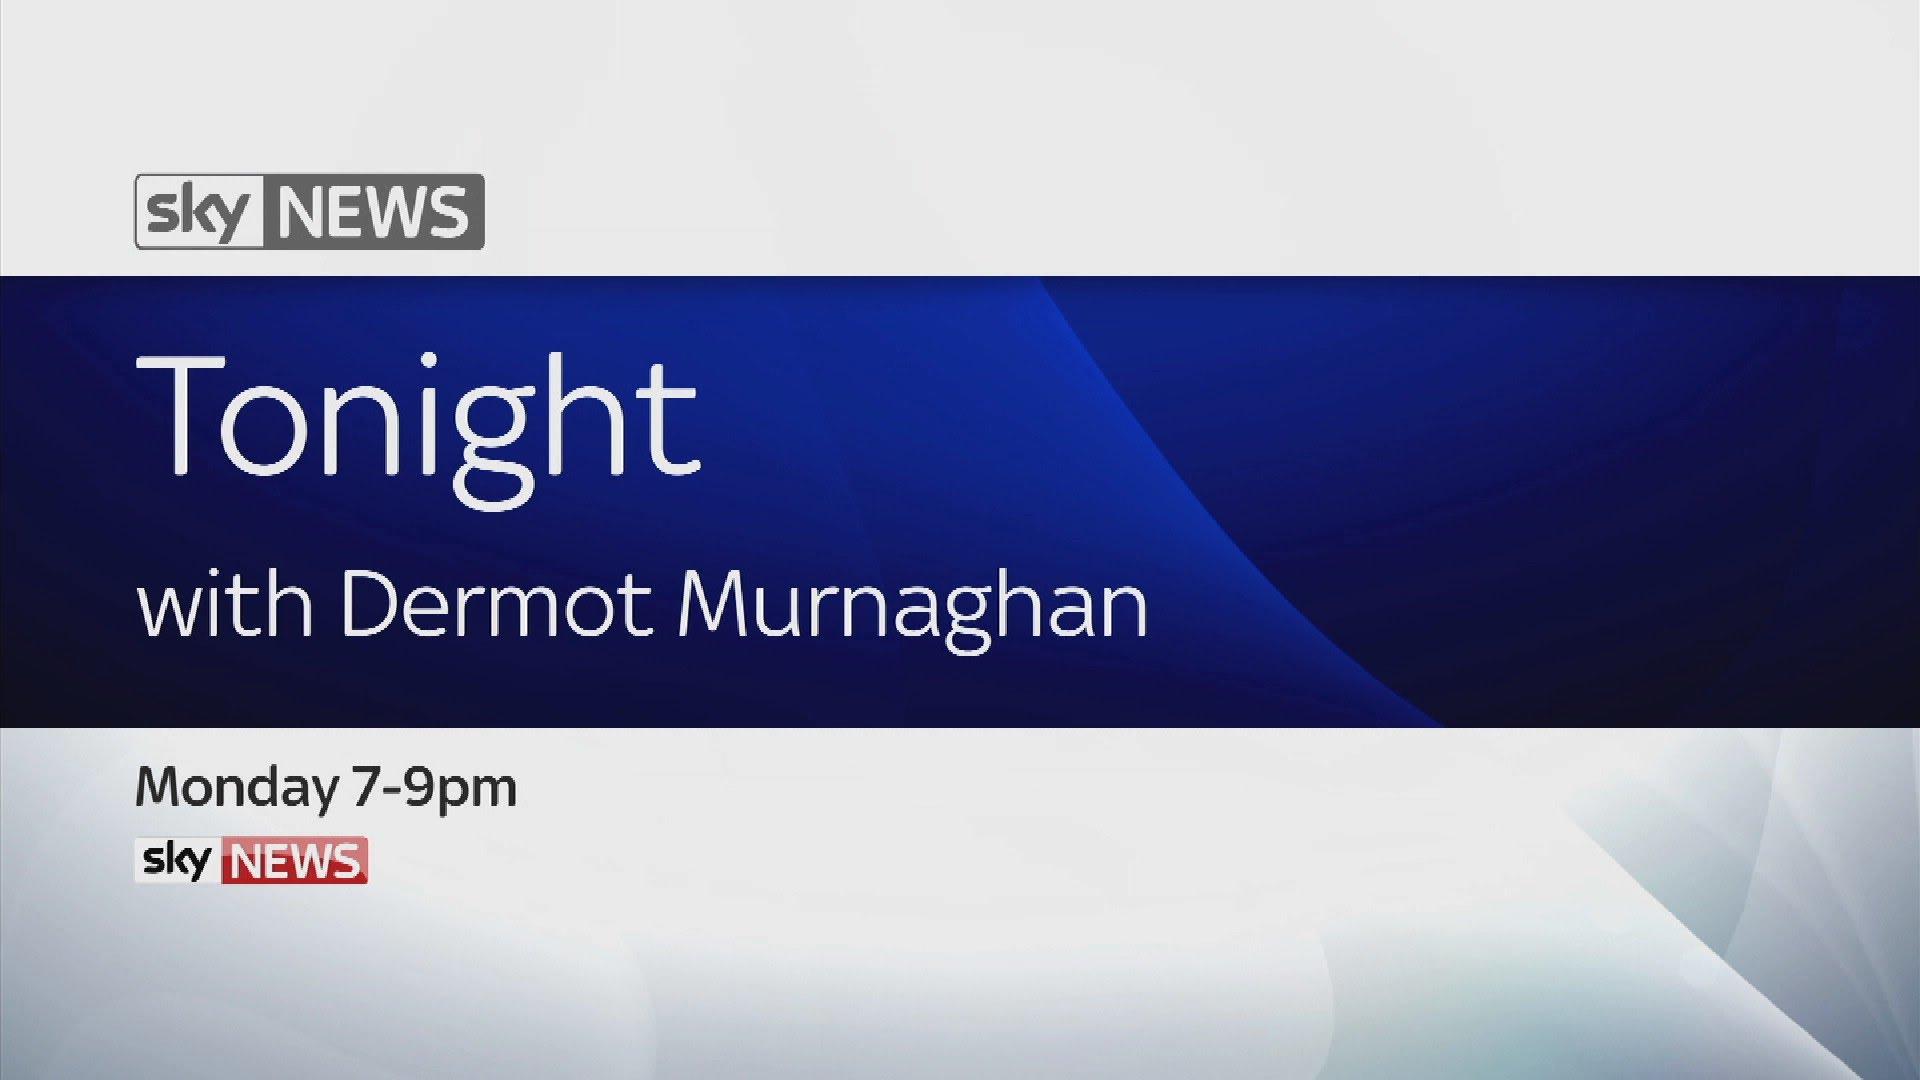 Sky News Tonight With Dermot Murnaghan 9